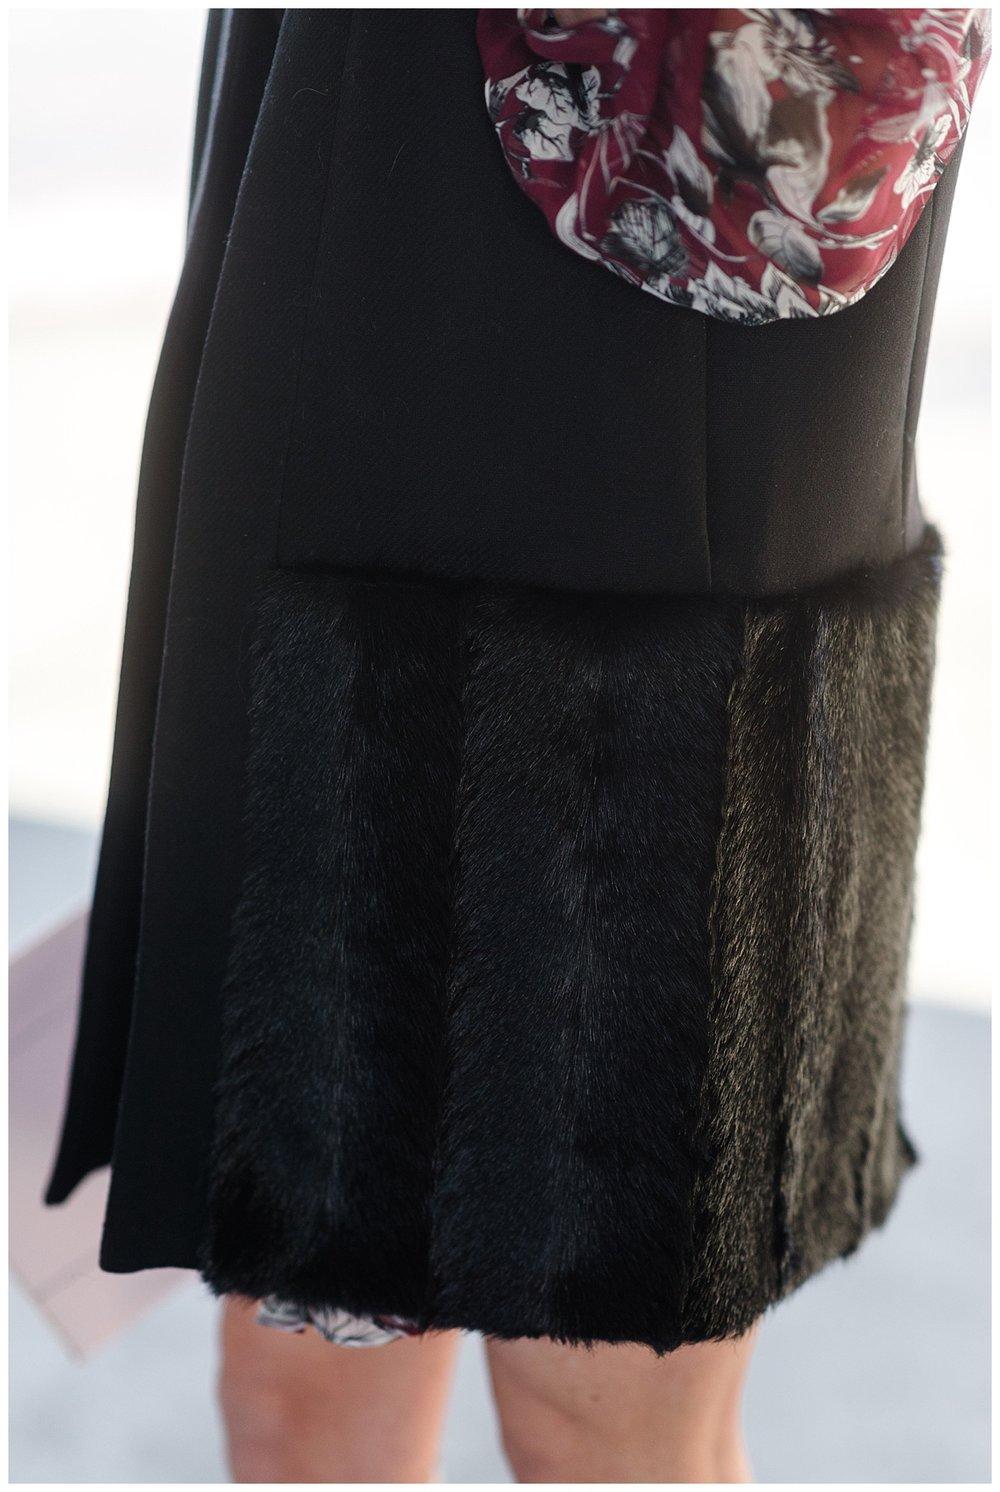 Rebecca Taylor dress two ways_0856.jpg